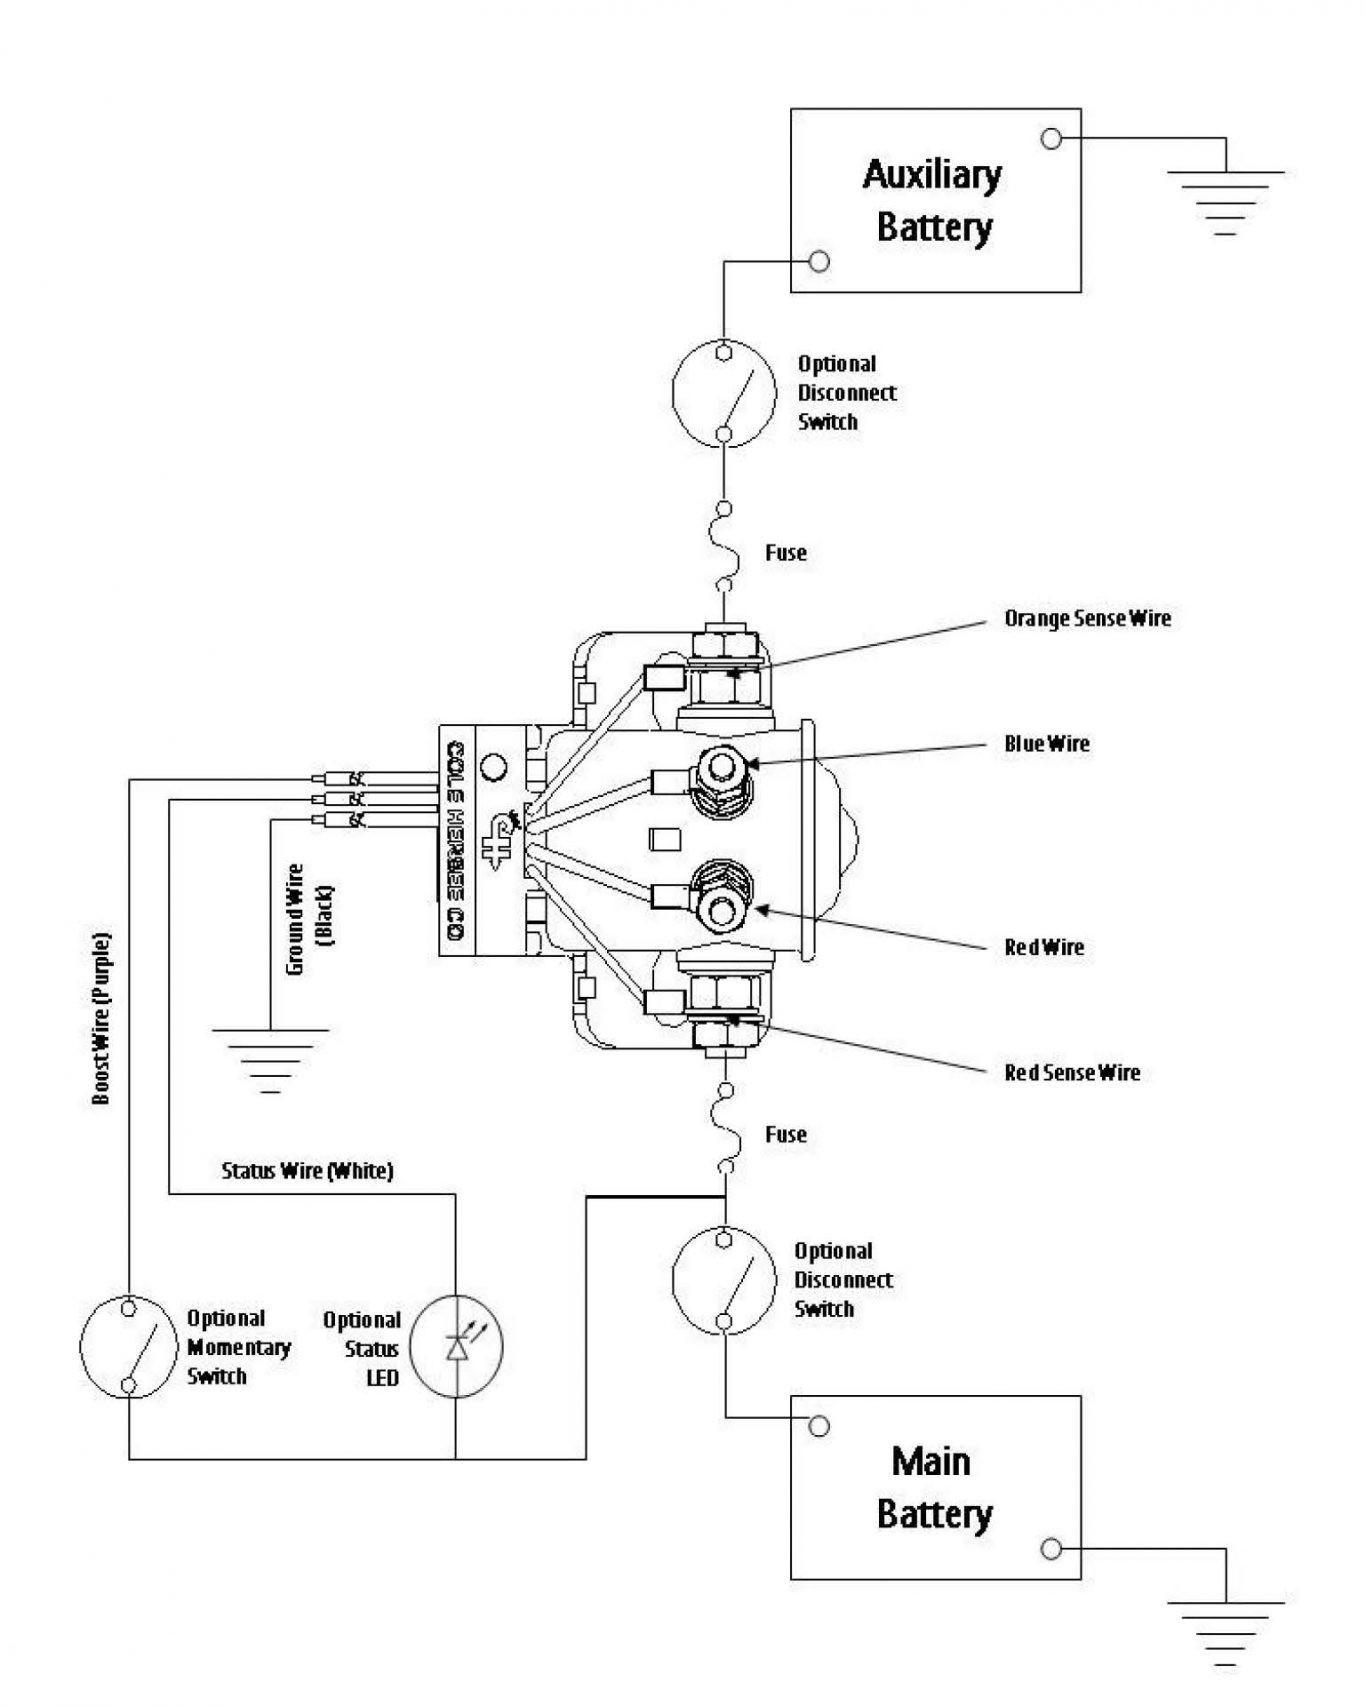 Wiring Diagram For Warn Winch Refrence Elegant Warn Winch Wiring Diagram Diagram